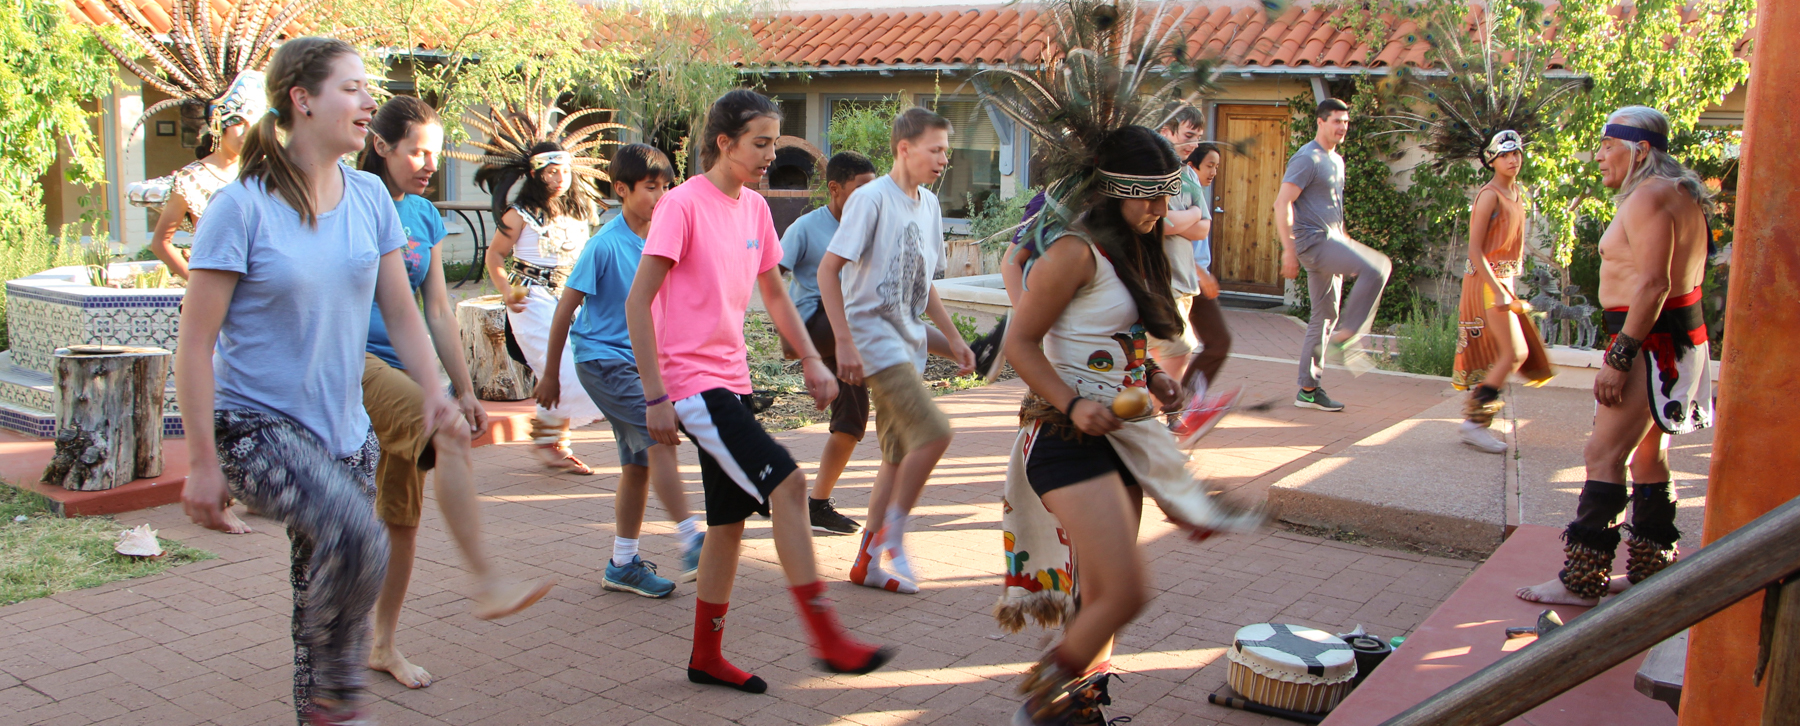 Adolescents - Greenspring Montessori School